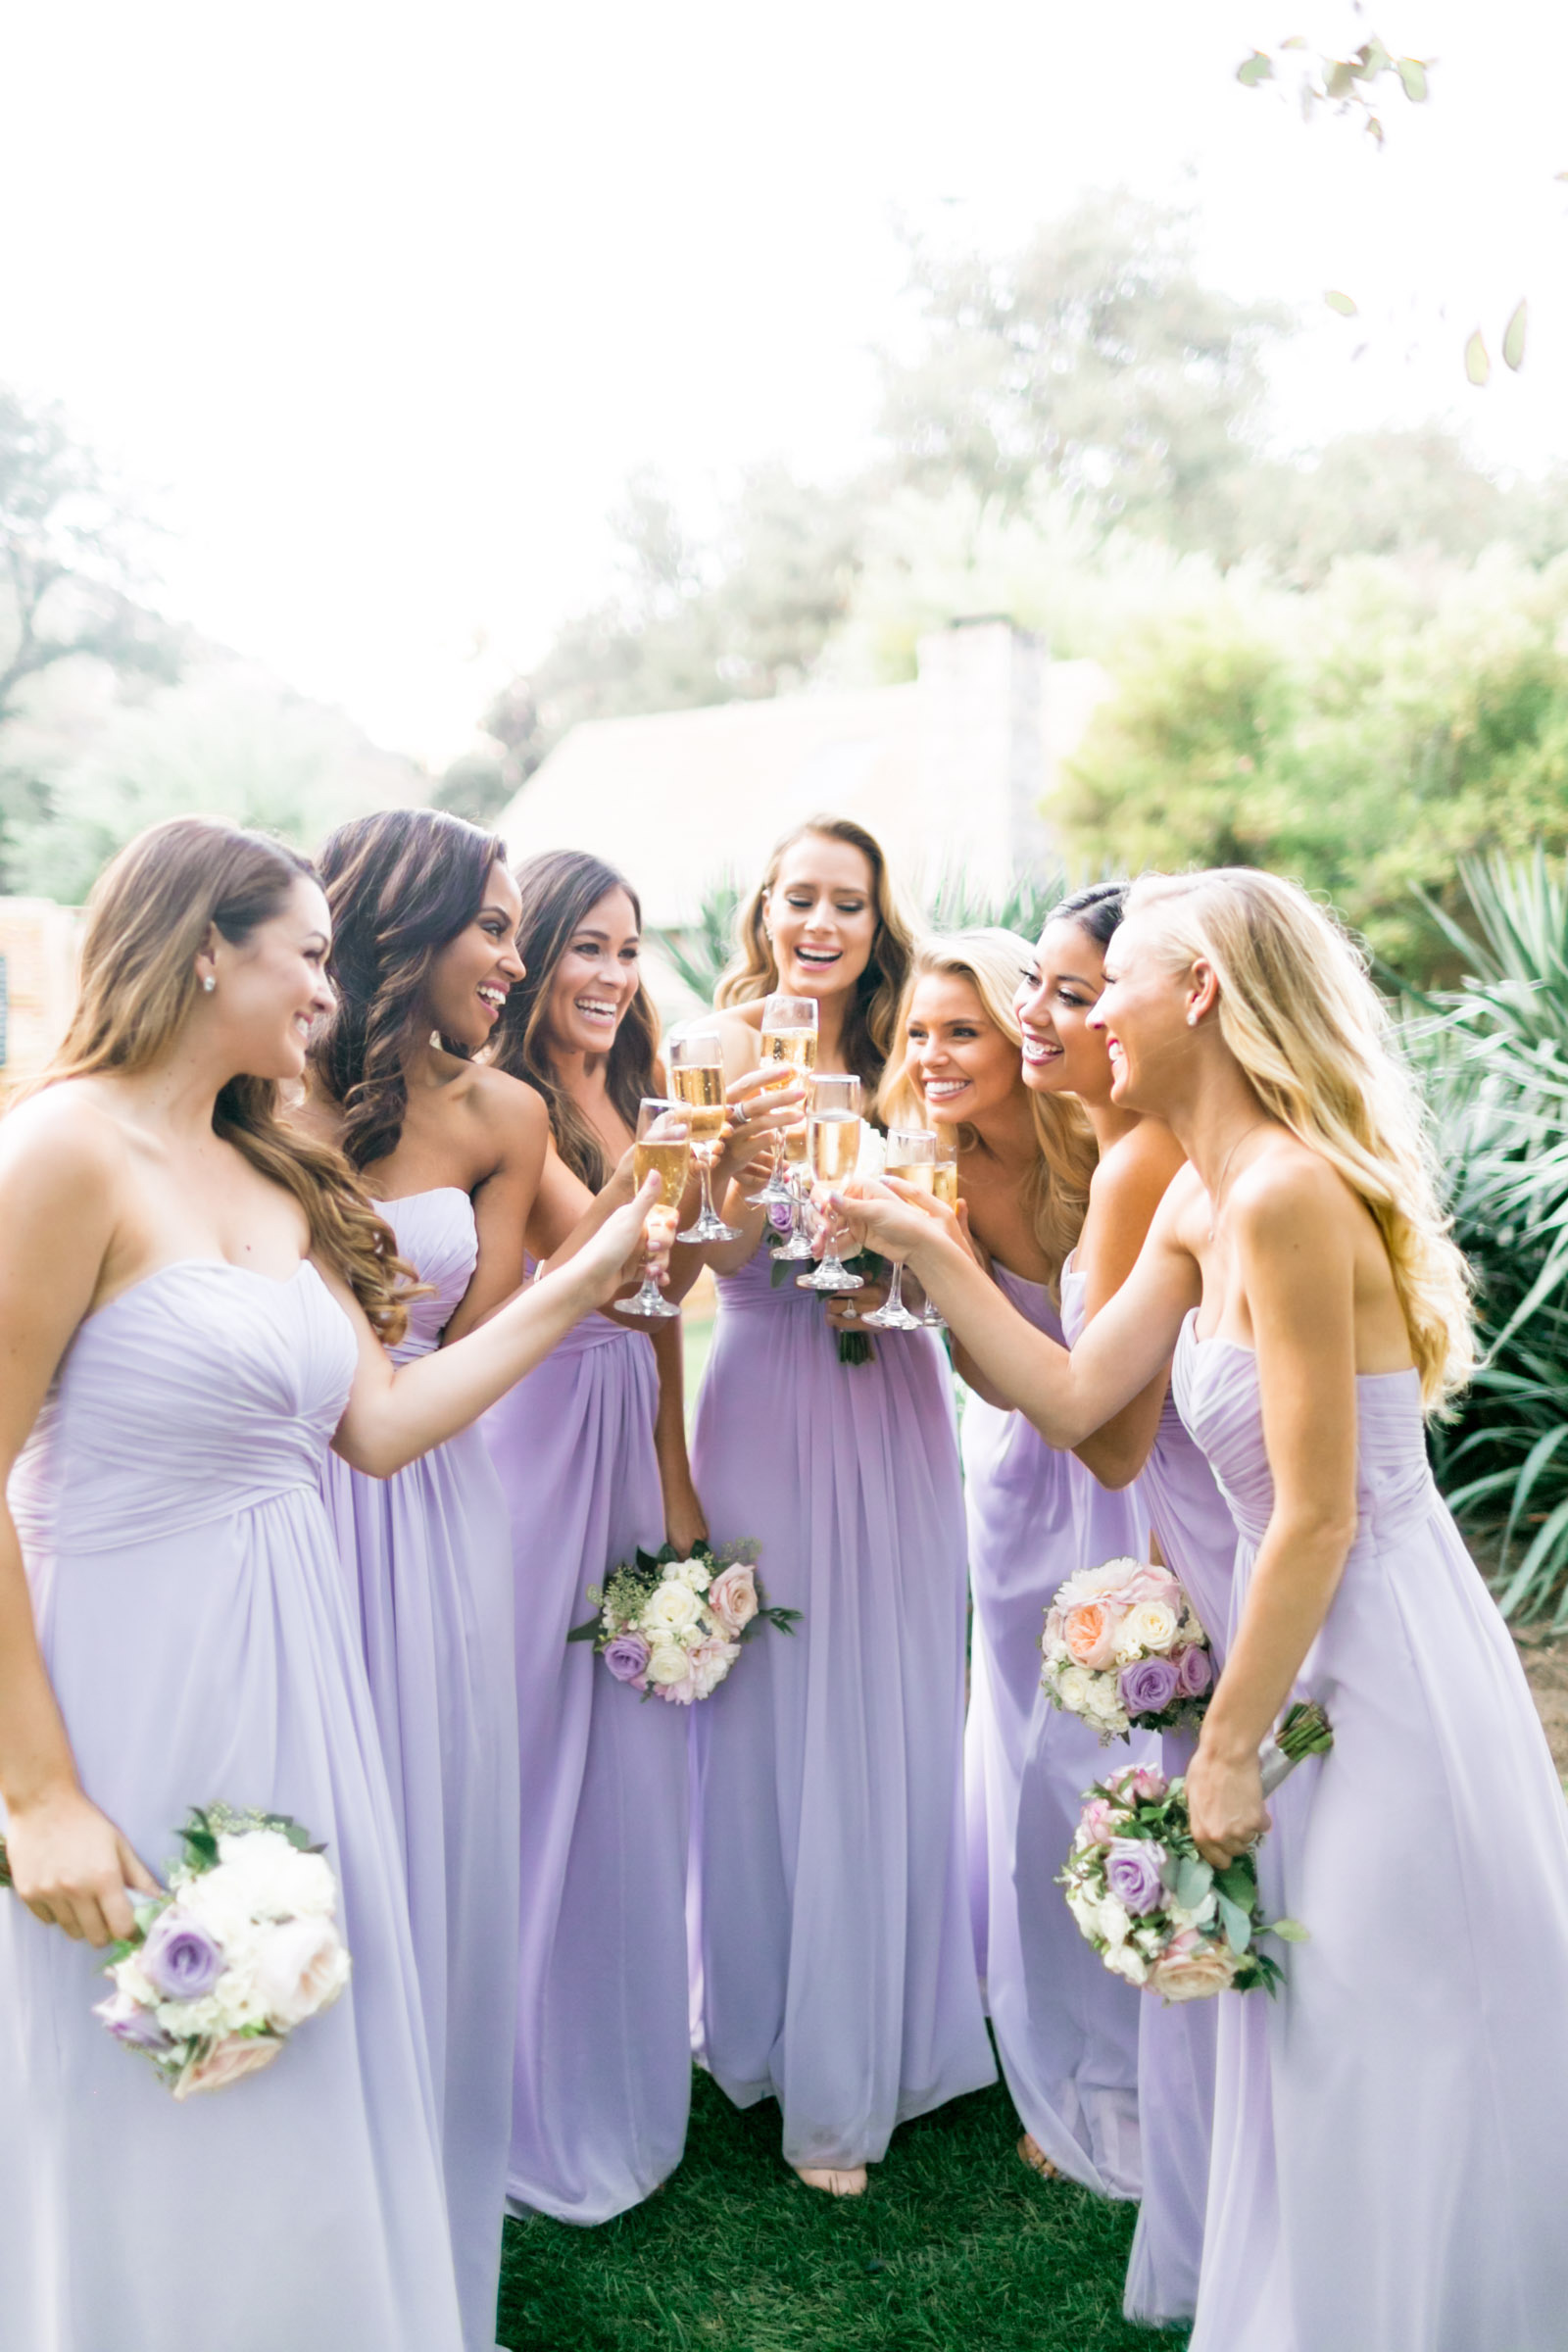 Nia-Sanchez-Temcula-Wedding-Natalie-Schutt-Photography_02.jpg